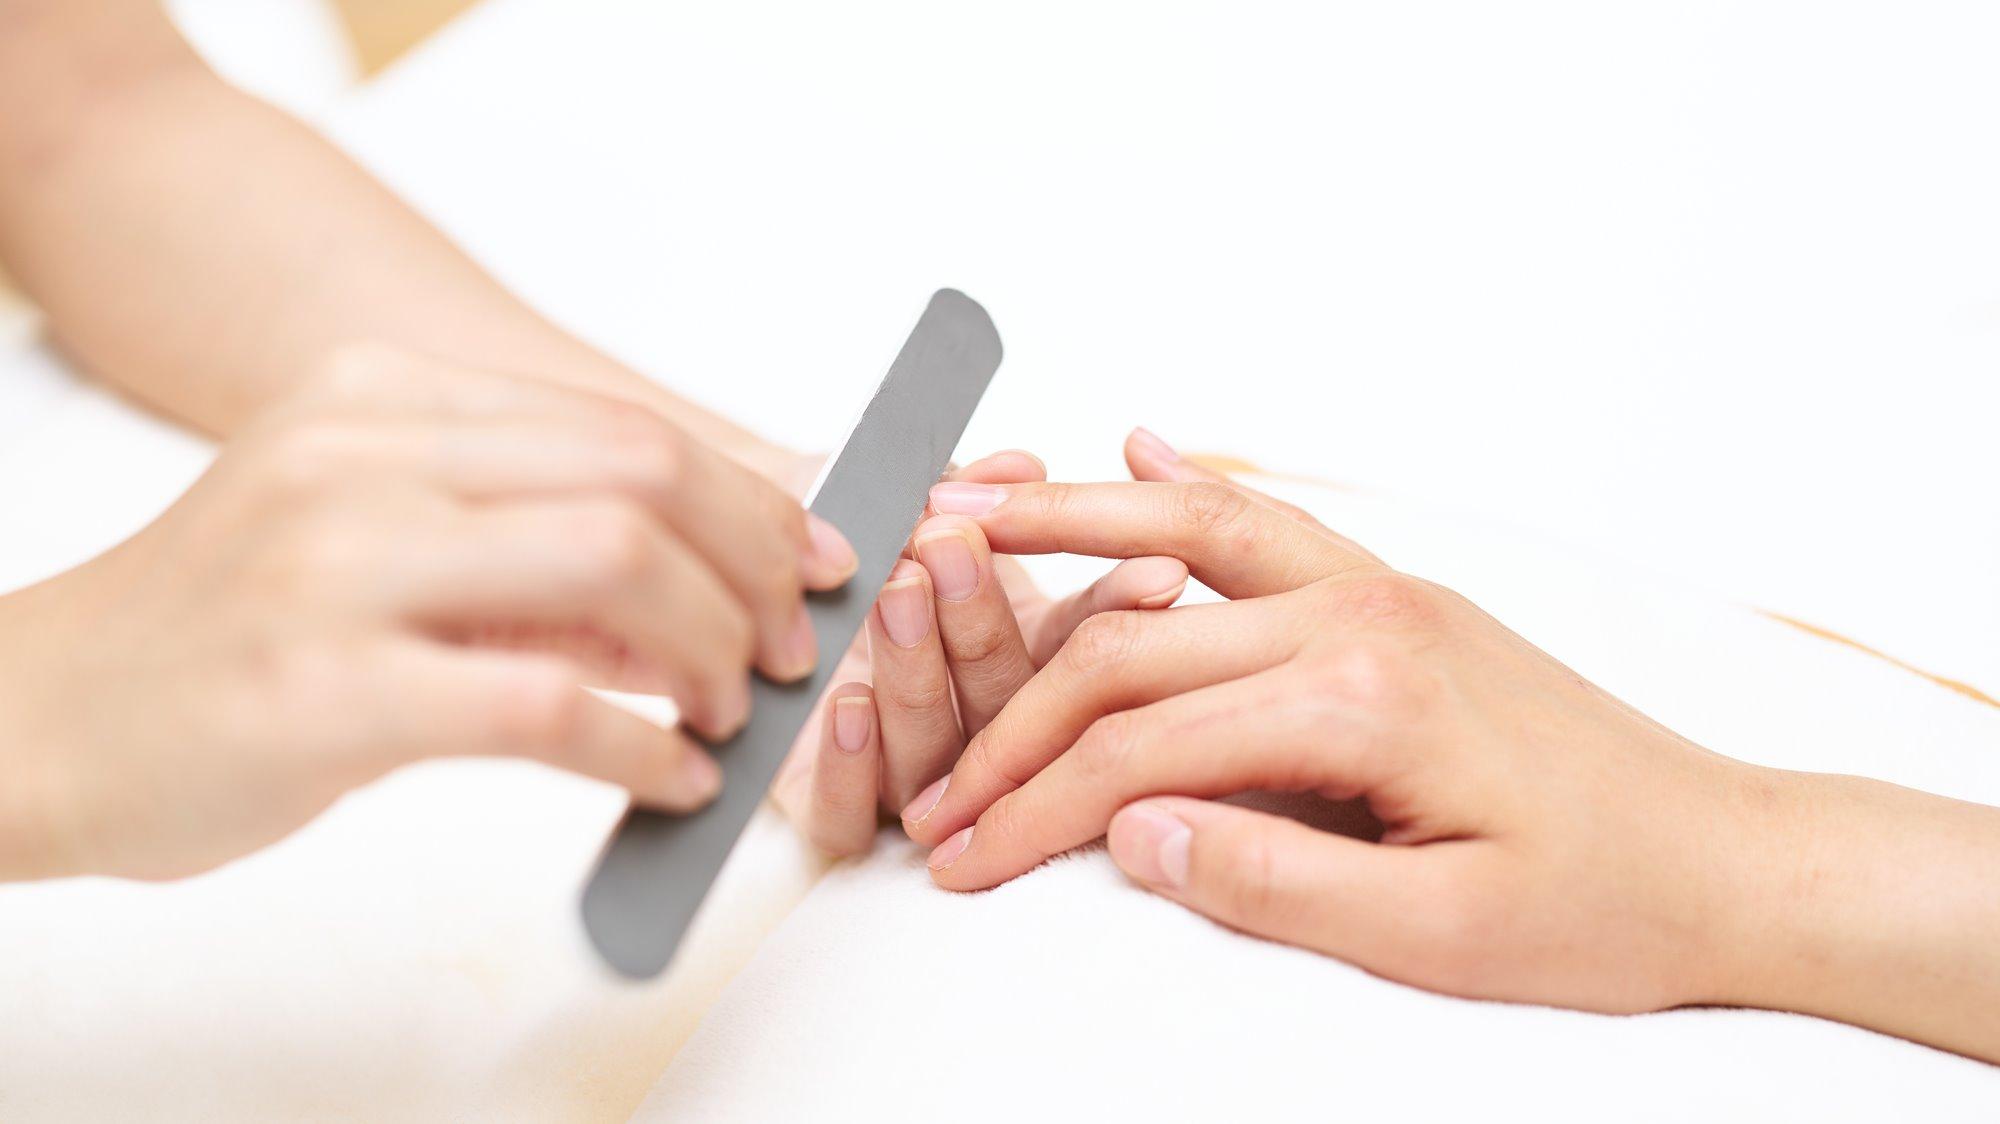 【HDC大阪 くらし向上計画】お洒落は指先から!大人女子のネイルケアレッスン